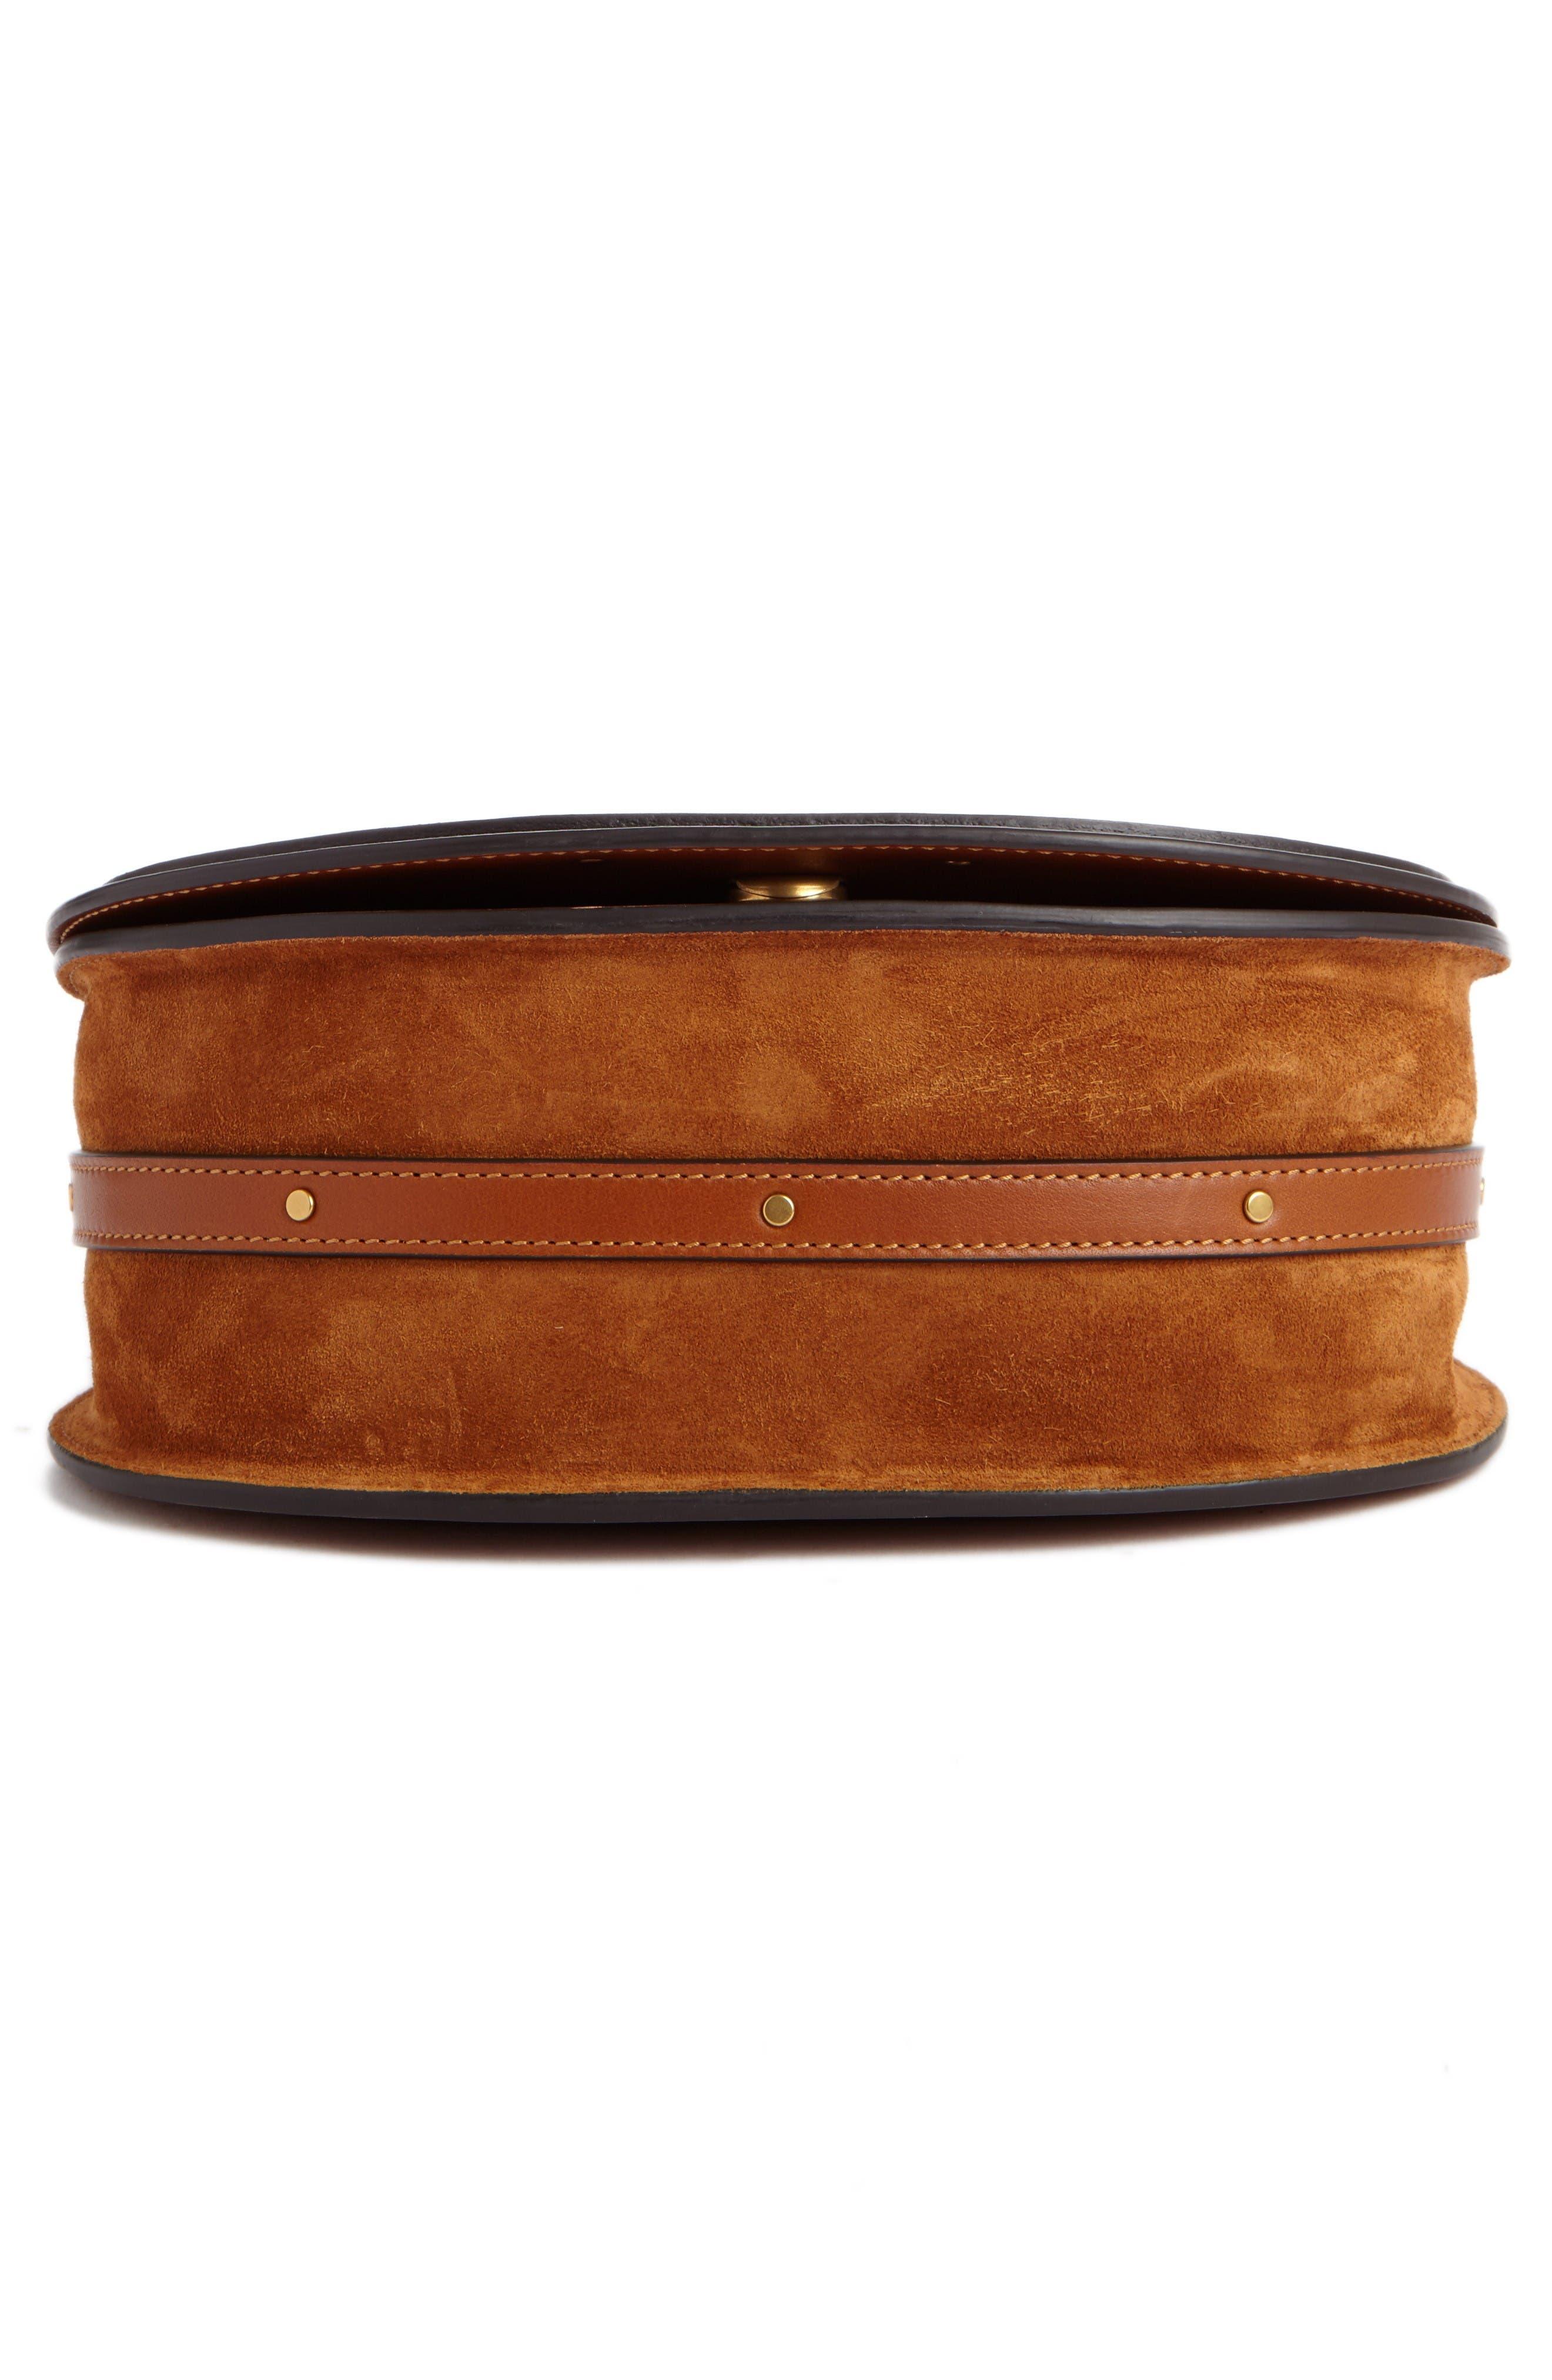 Medium Nile Leather Bracelet Saddle Bag,                             Alternate thumbnail 4, color,                             Bdu Caramel